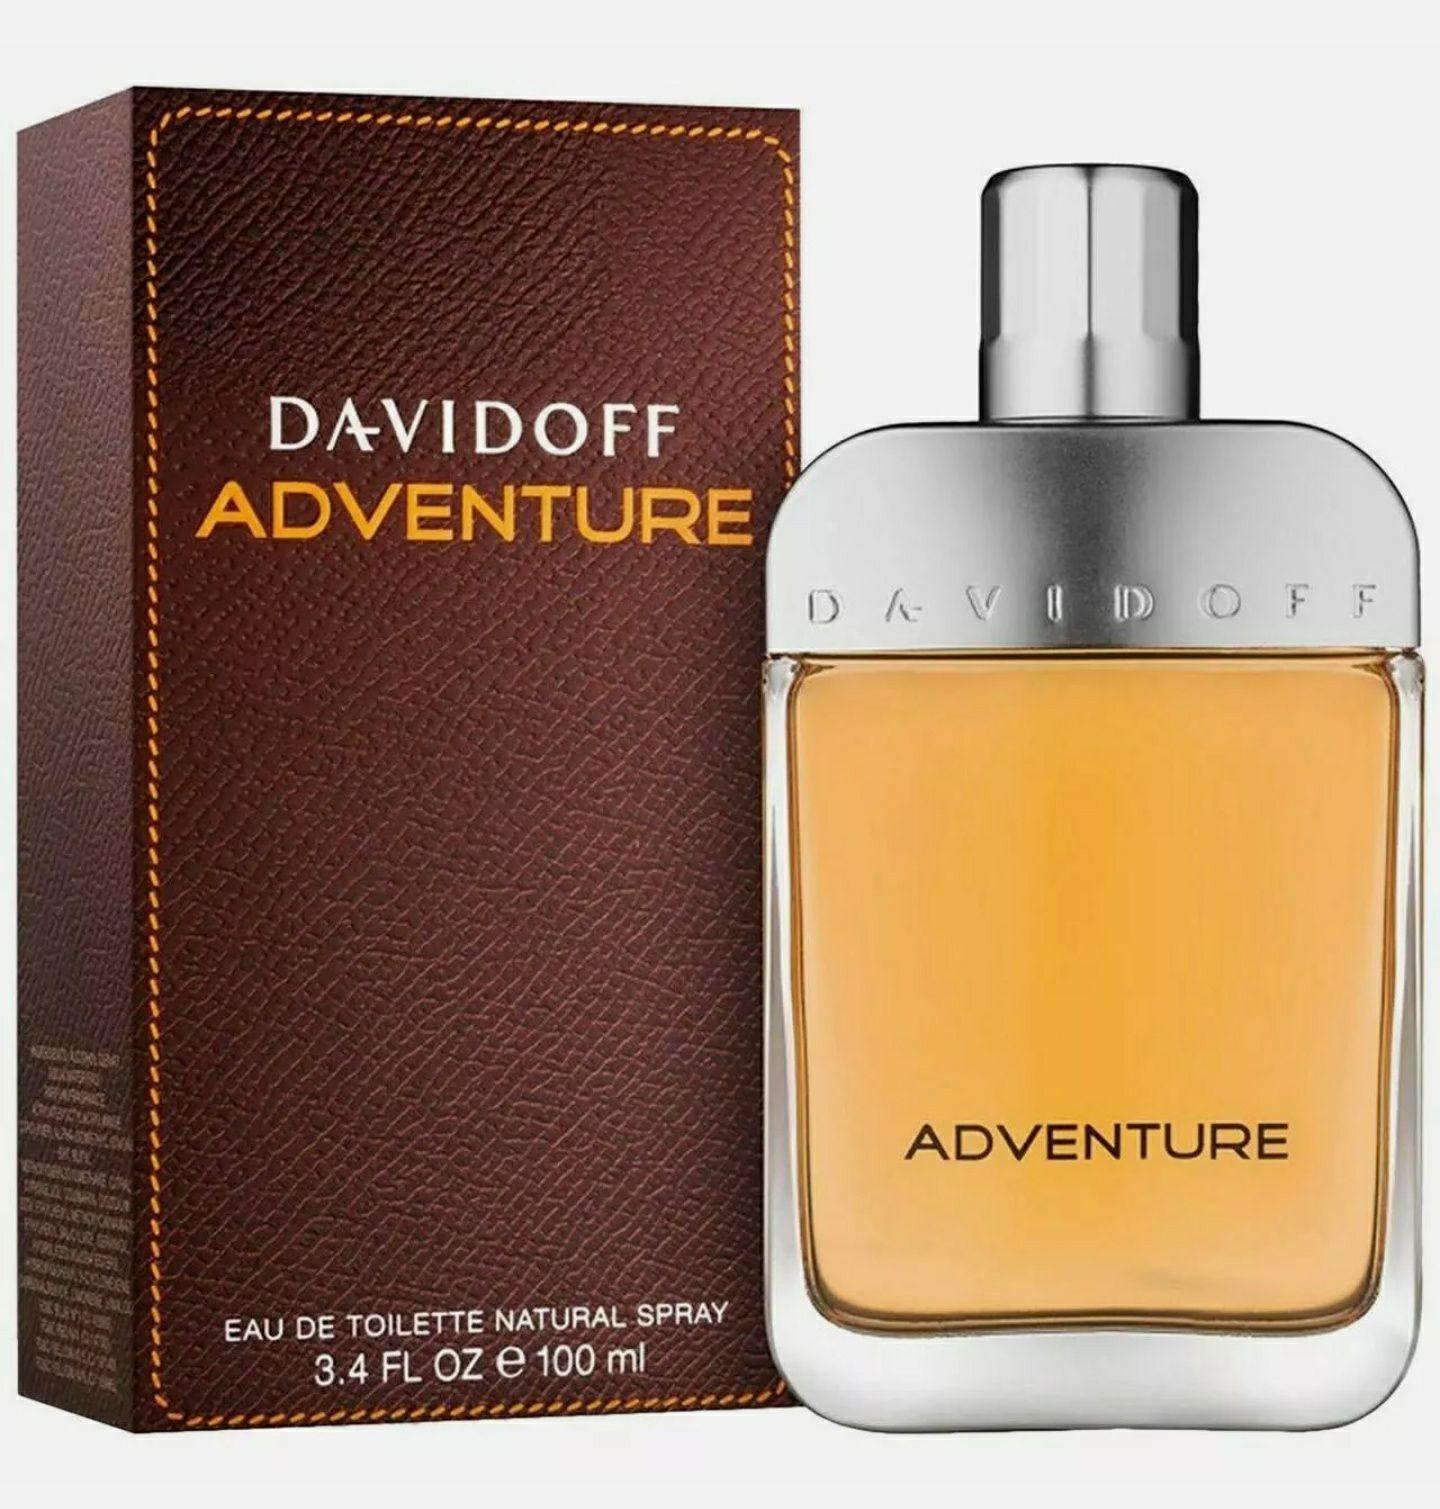 Davidoff Adventure For Men Eau De Toilette Spray (100ml) - £15 @ beauty-scent / eBay